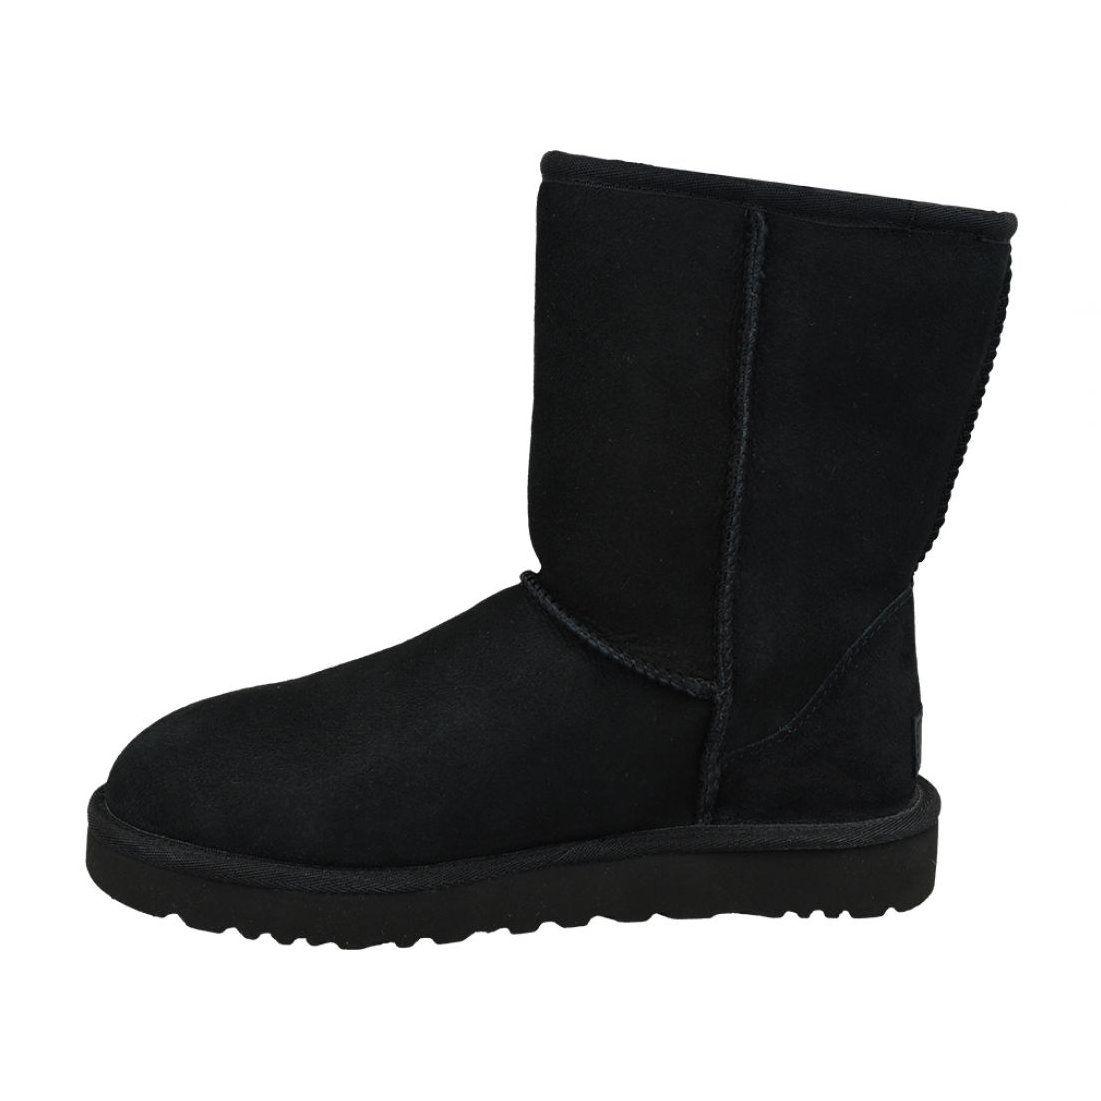 Ugg Classic Short Ii Shoes W 1016223 Blk Black Uggs Ugg Classic Ugg Classic Short